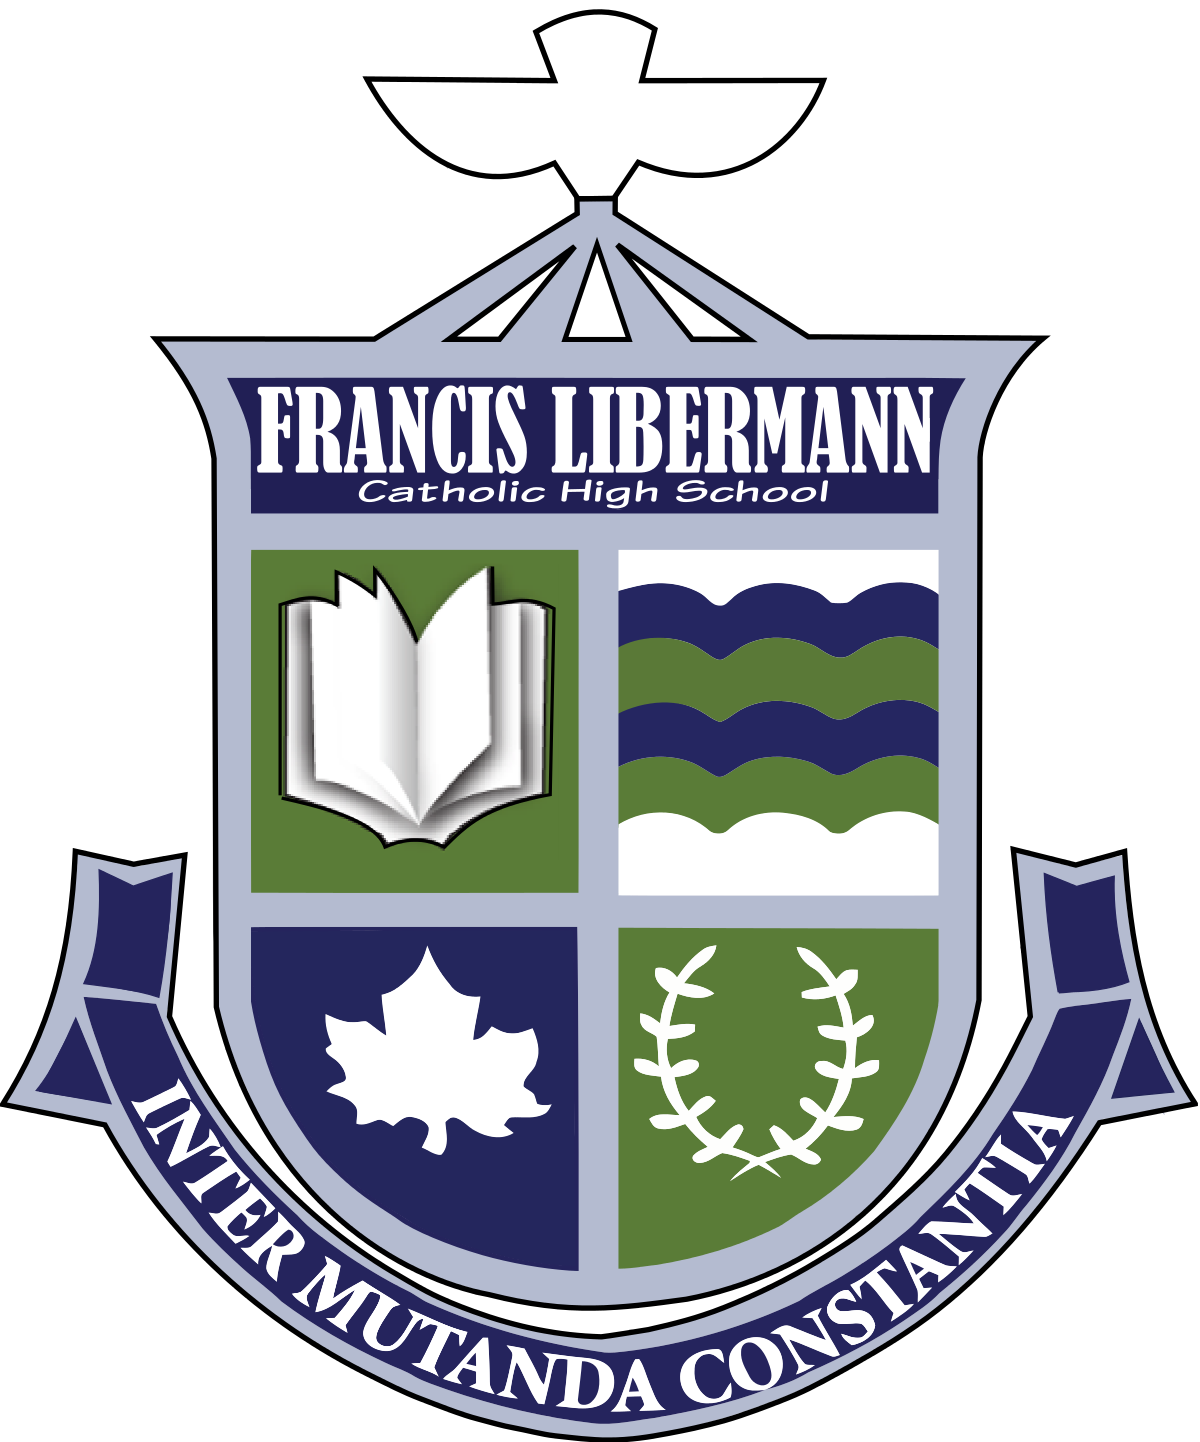 Francis Libermann Catholic High School.